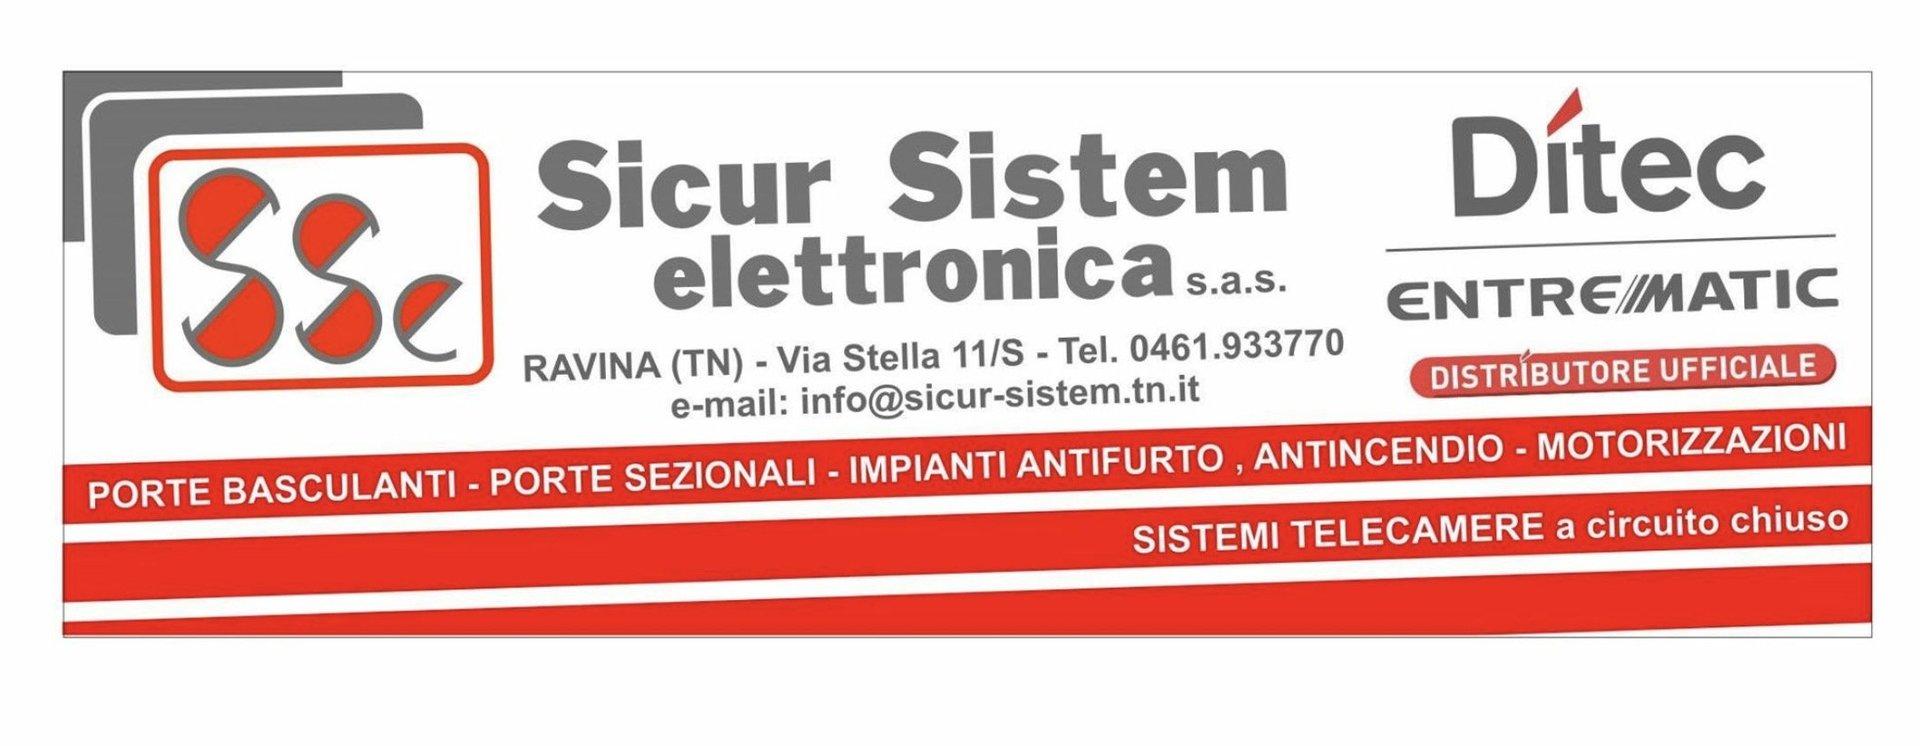 Sicur Sistem Elettronica SAS Trento